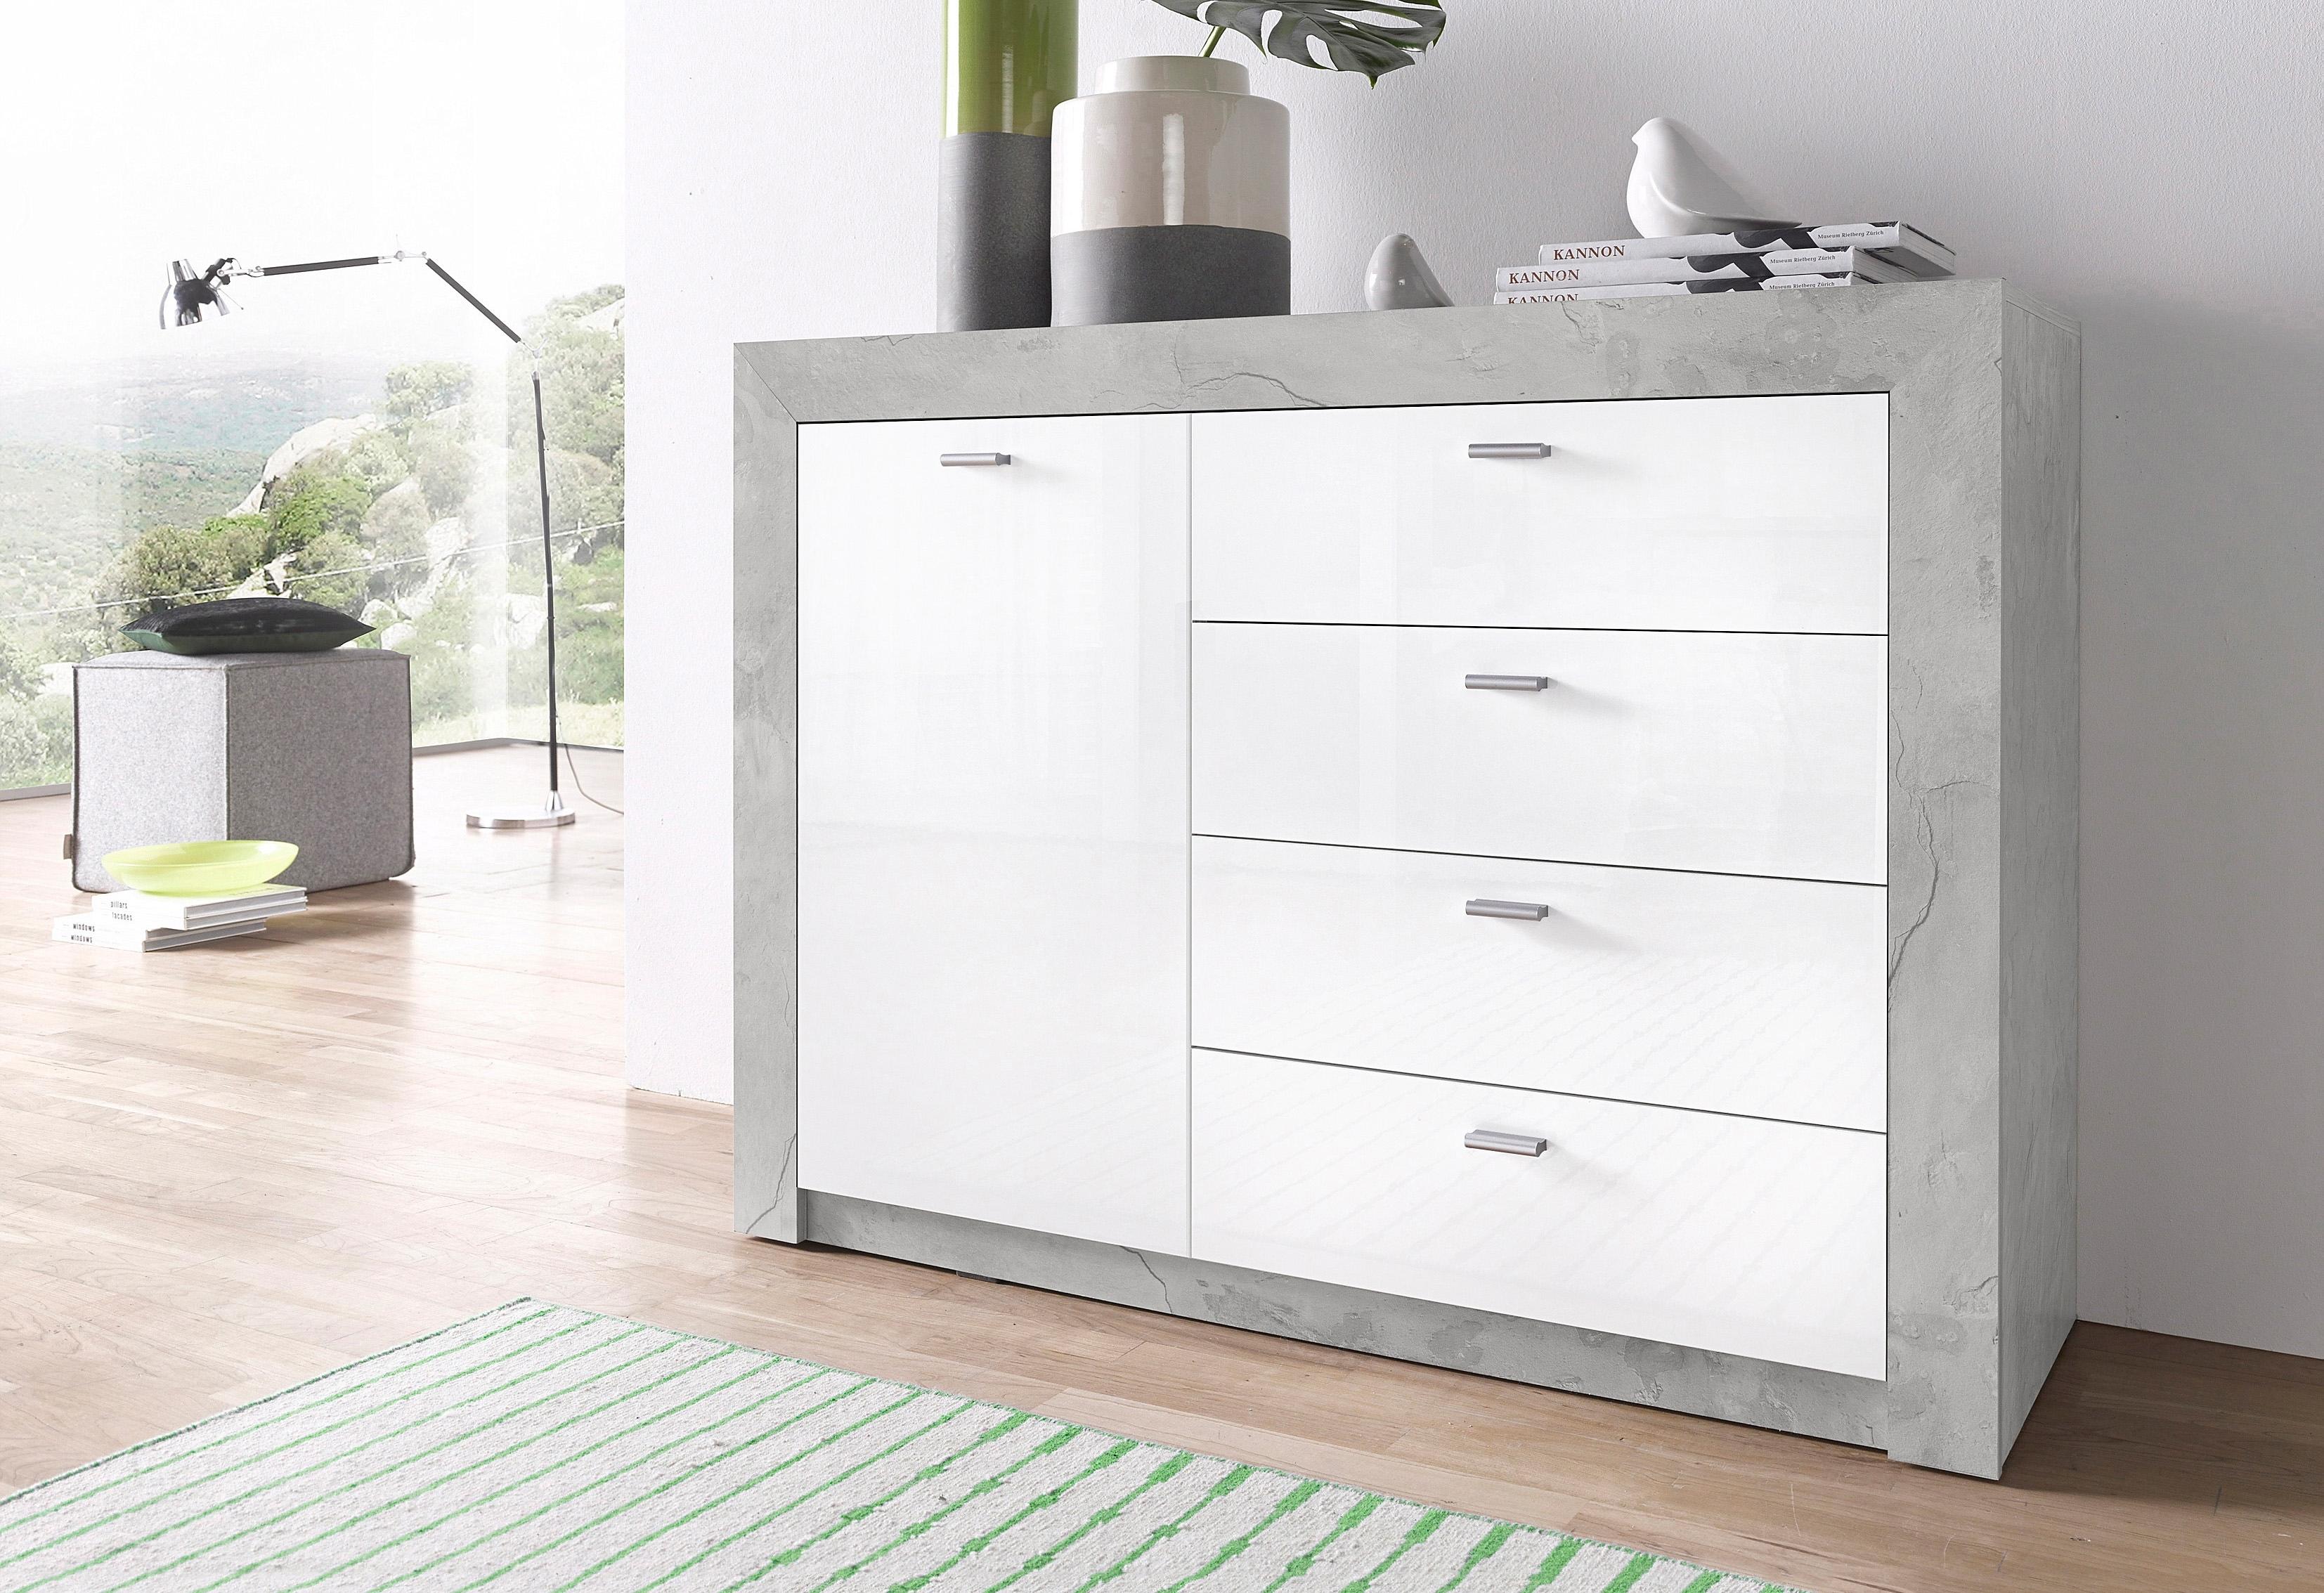 Trendmanufaktur Sideboard 120 cm breed - gratis ruilen op otto.nl